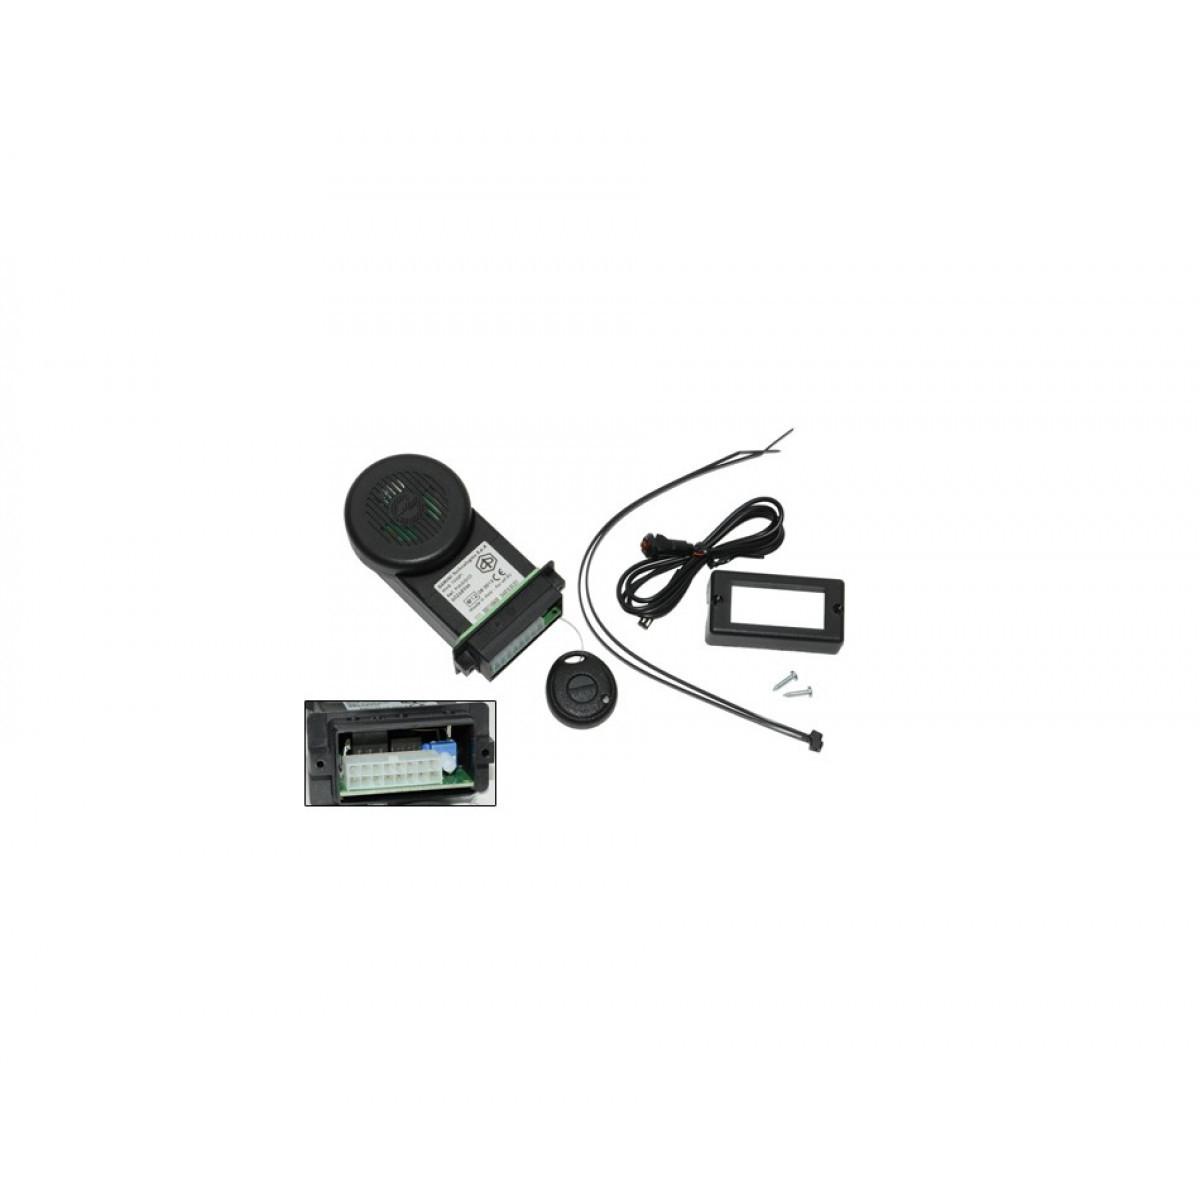 scooter-alarm-e1-origineel-piaggio-602689m-zonder-backup-stroom(1)